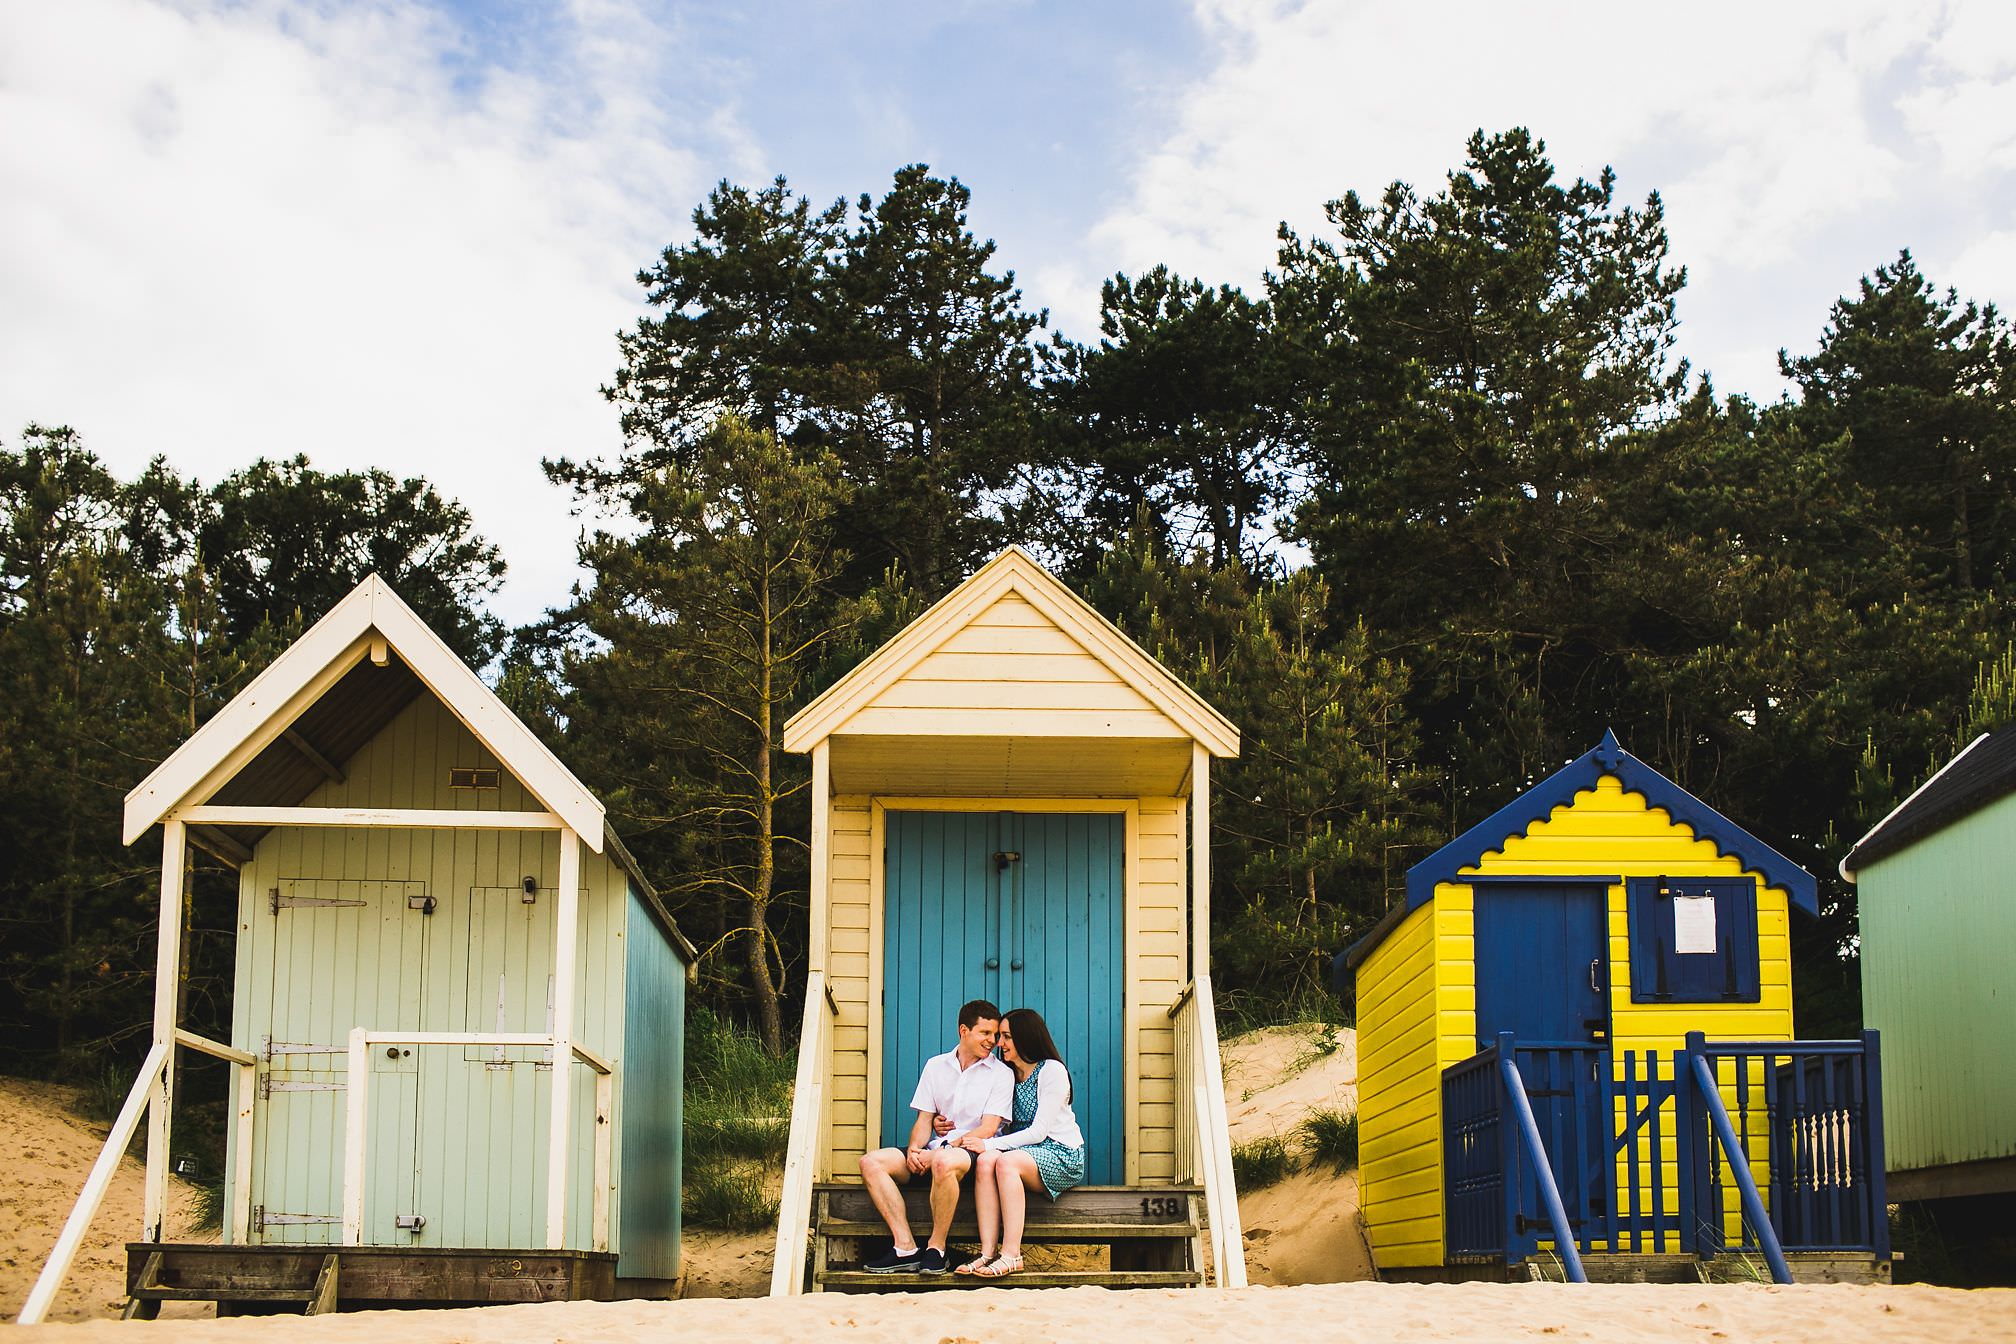 Wells-next-the-Sea Beach Hut Pre-Wedding Photo